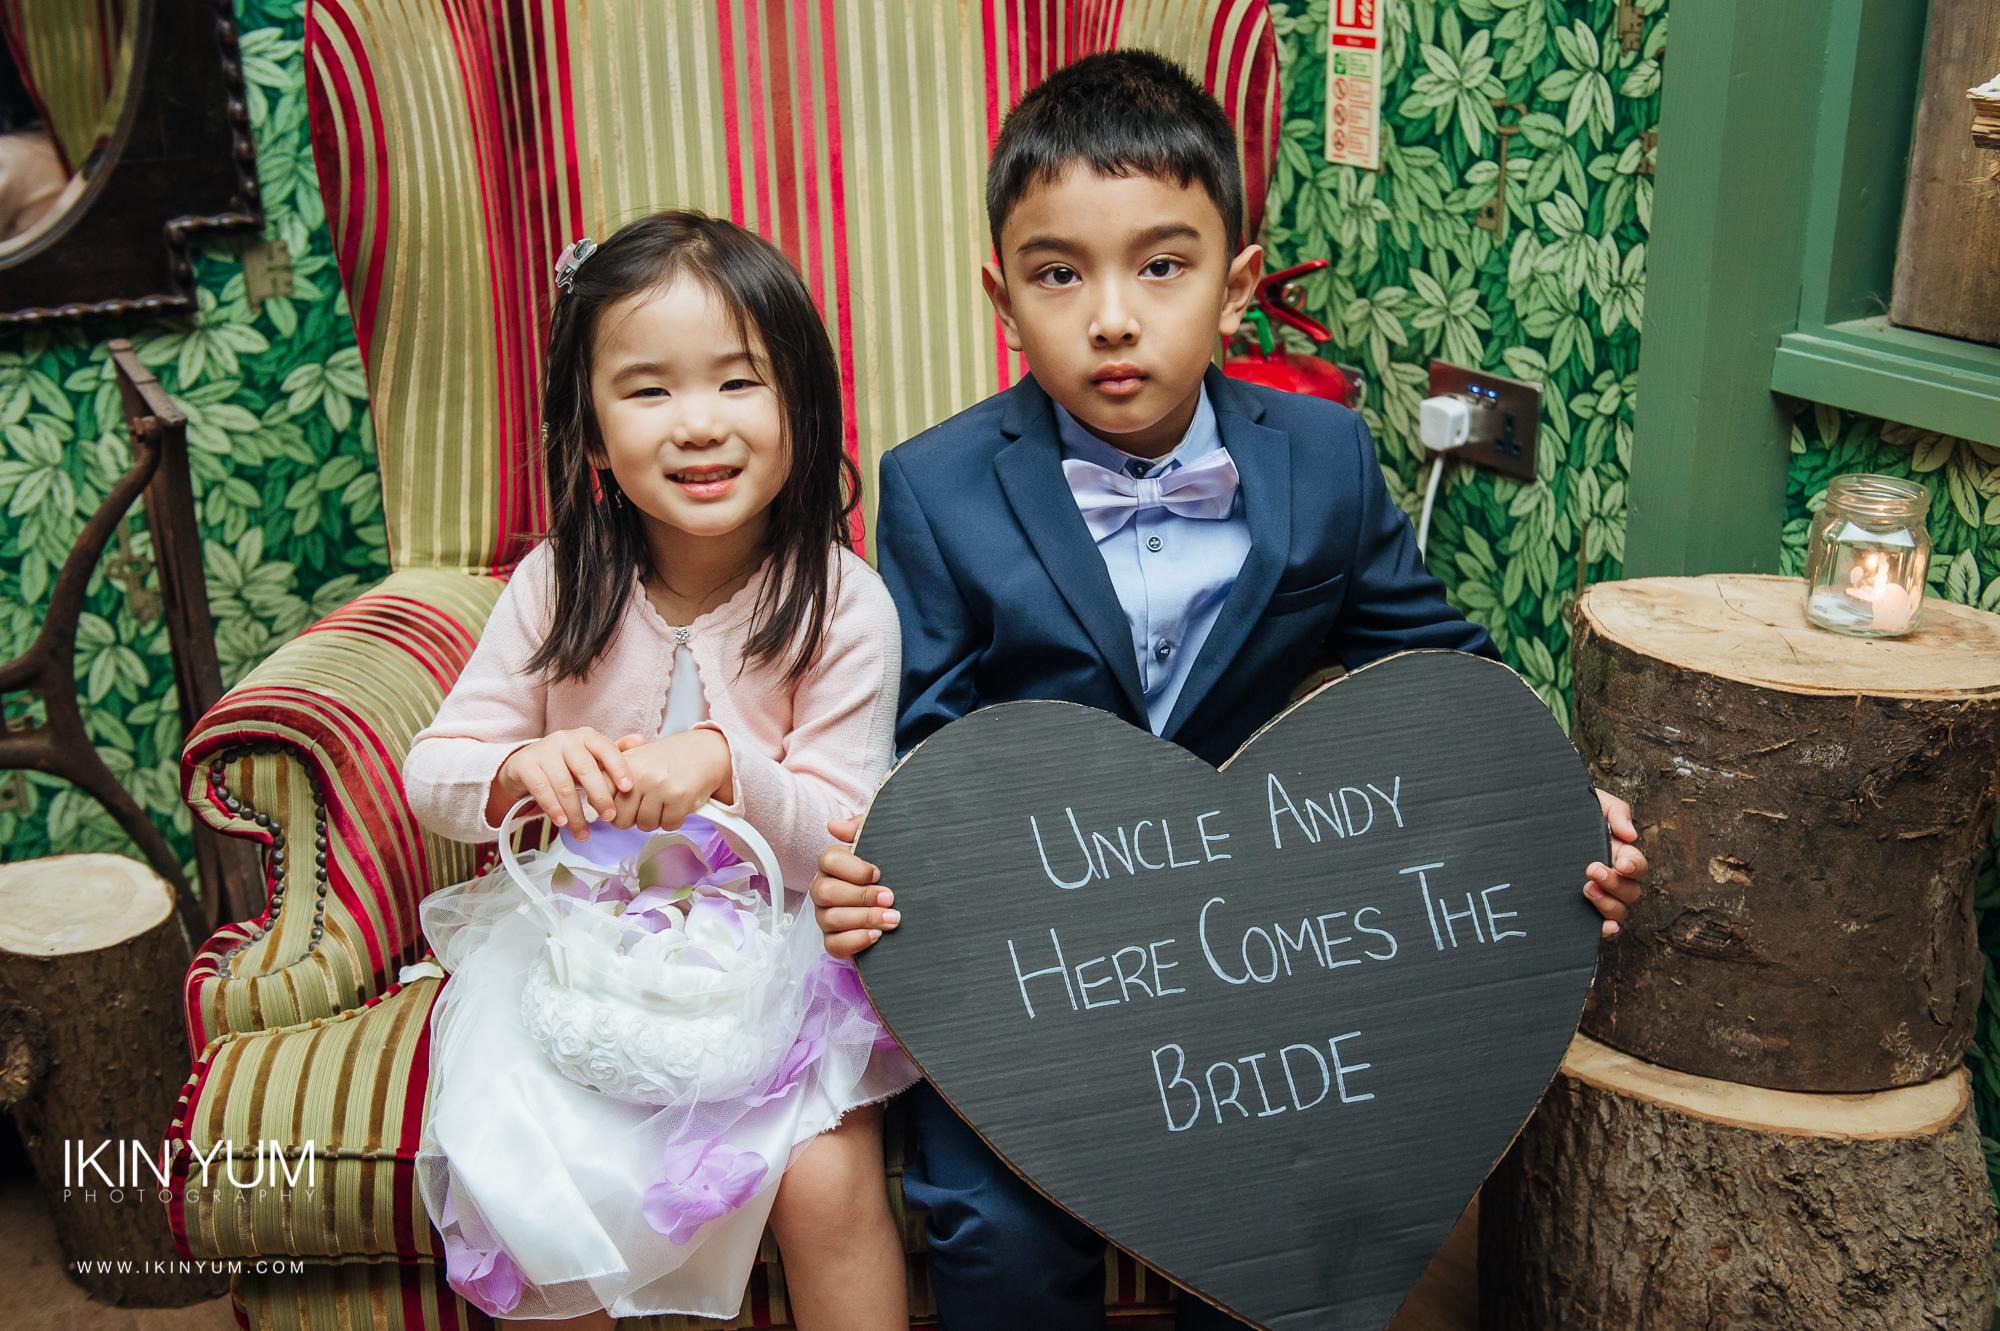 Hampton Manor Wedding - Ikin Yum Photography -066.jpg